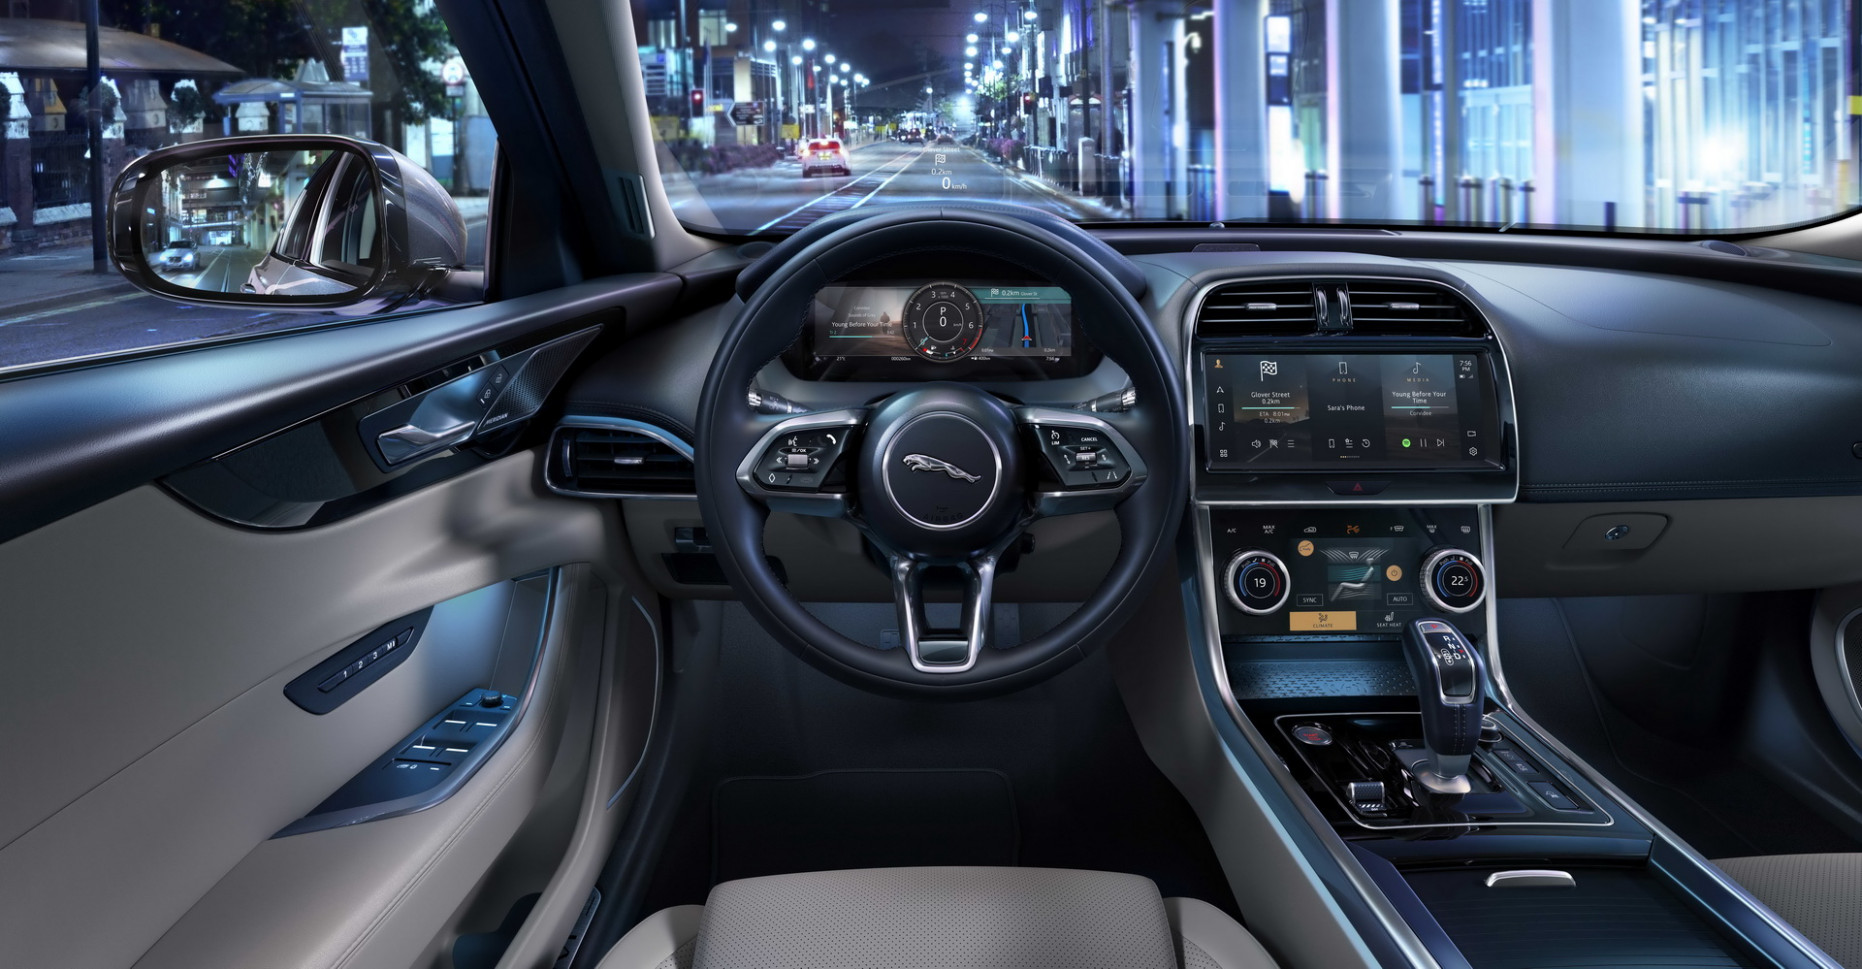 Price, Design and Review 2022 Jaguar Xe Review